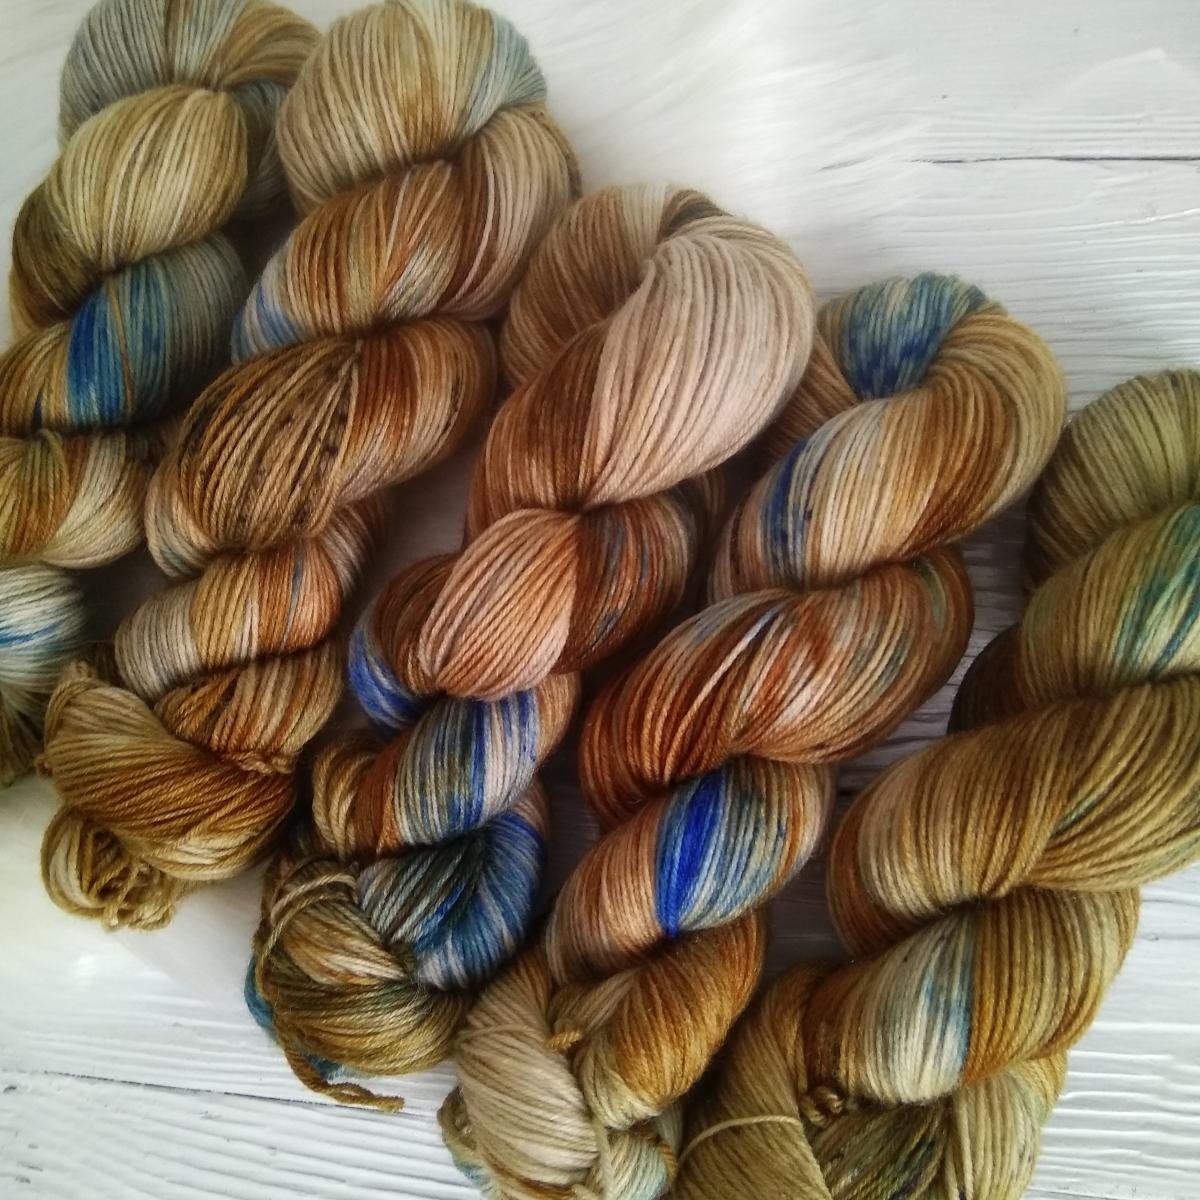 woodico.pro hand dyed yarn 036 6 1200x1200 - Hand dyed yarn / 036